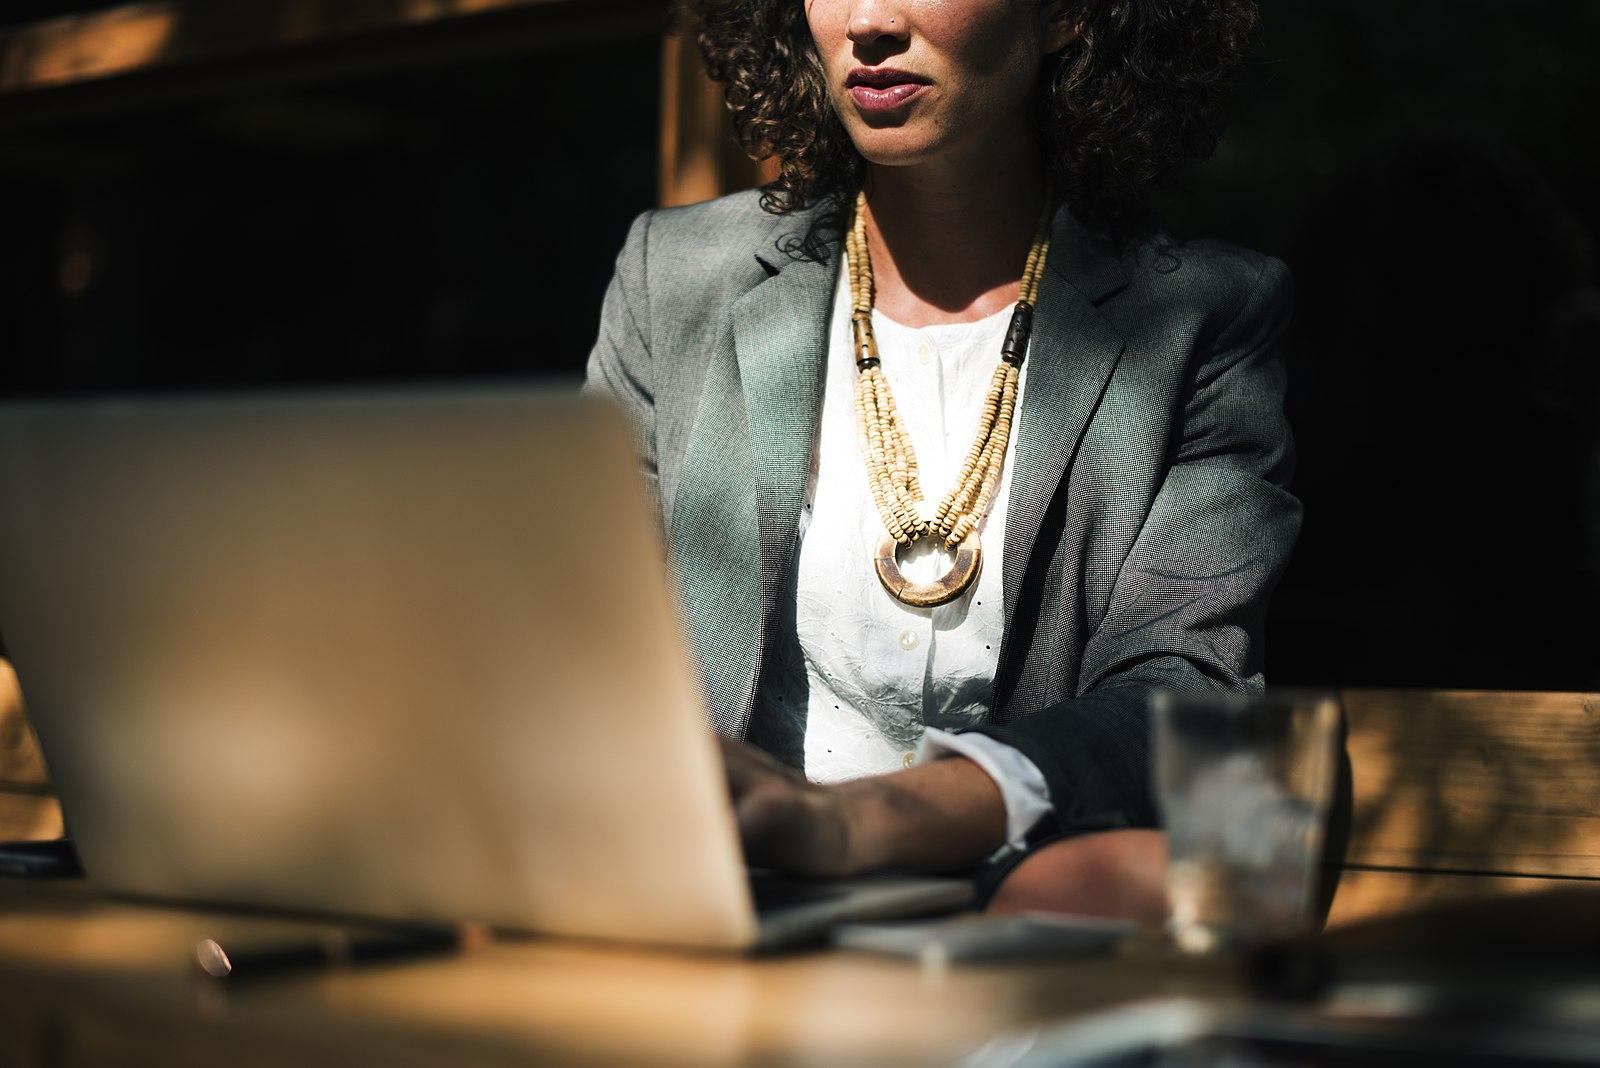 Businesswoman_working_at_table_(Unsplash).jpg